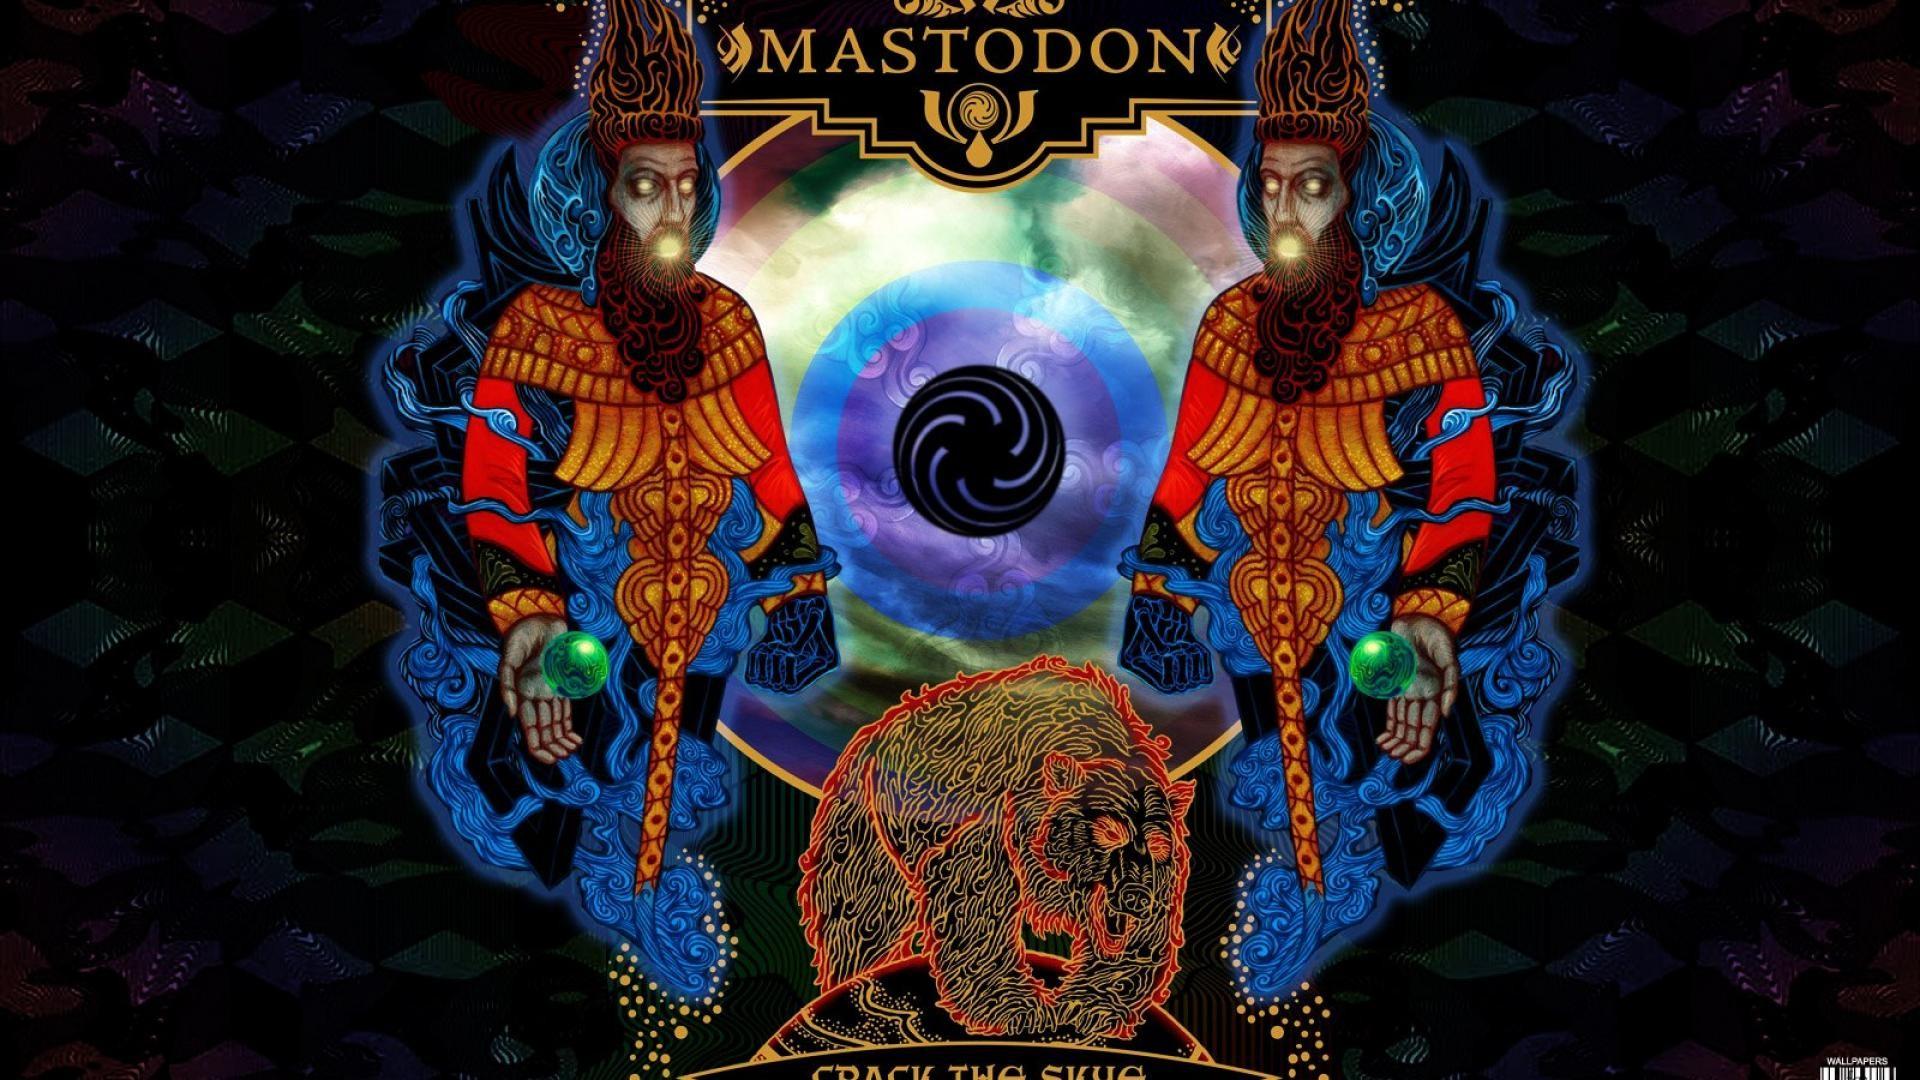 Res: 1920x1080, Mastodon Wallpaper - WallpaperSafari Mastodon Once More Round The Sun  Wallpaper